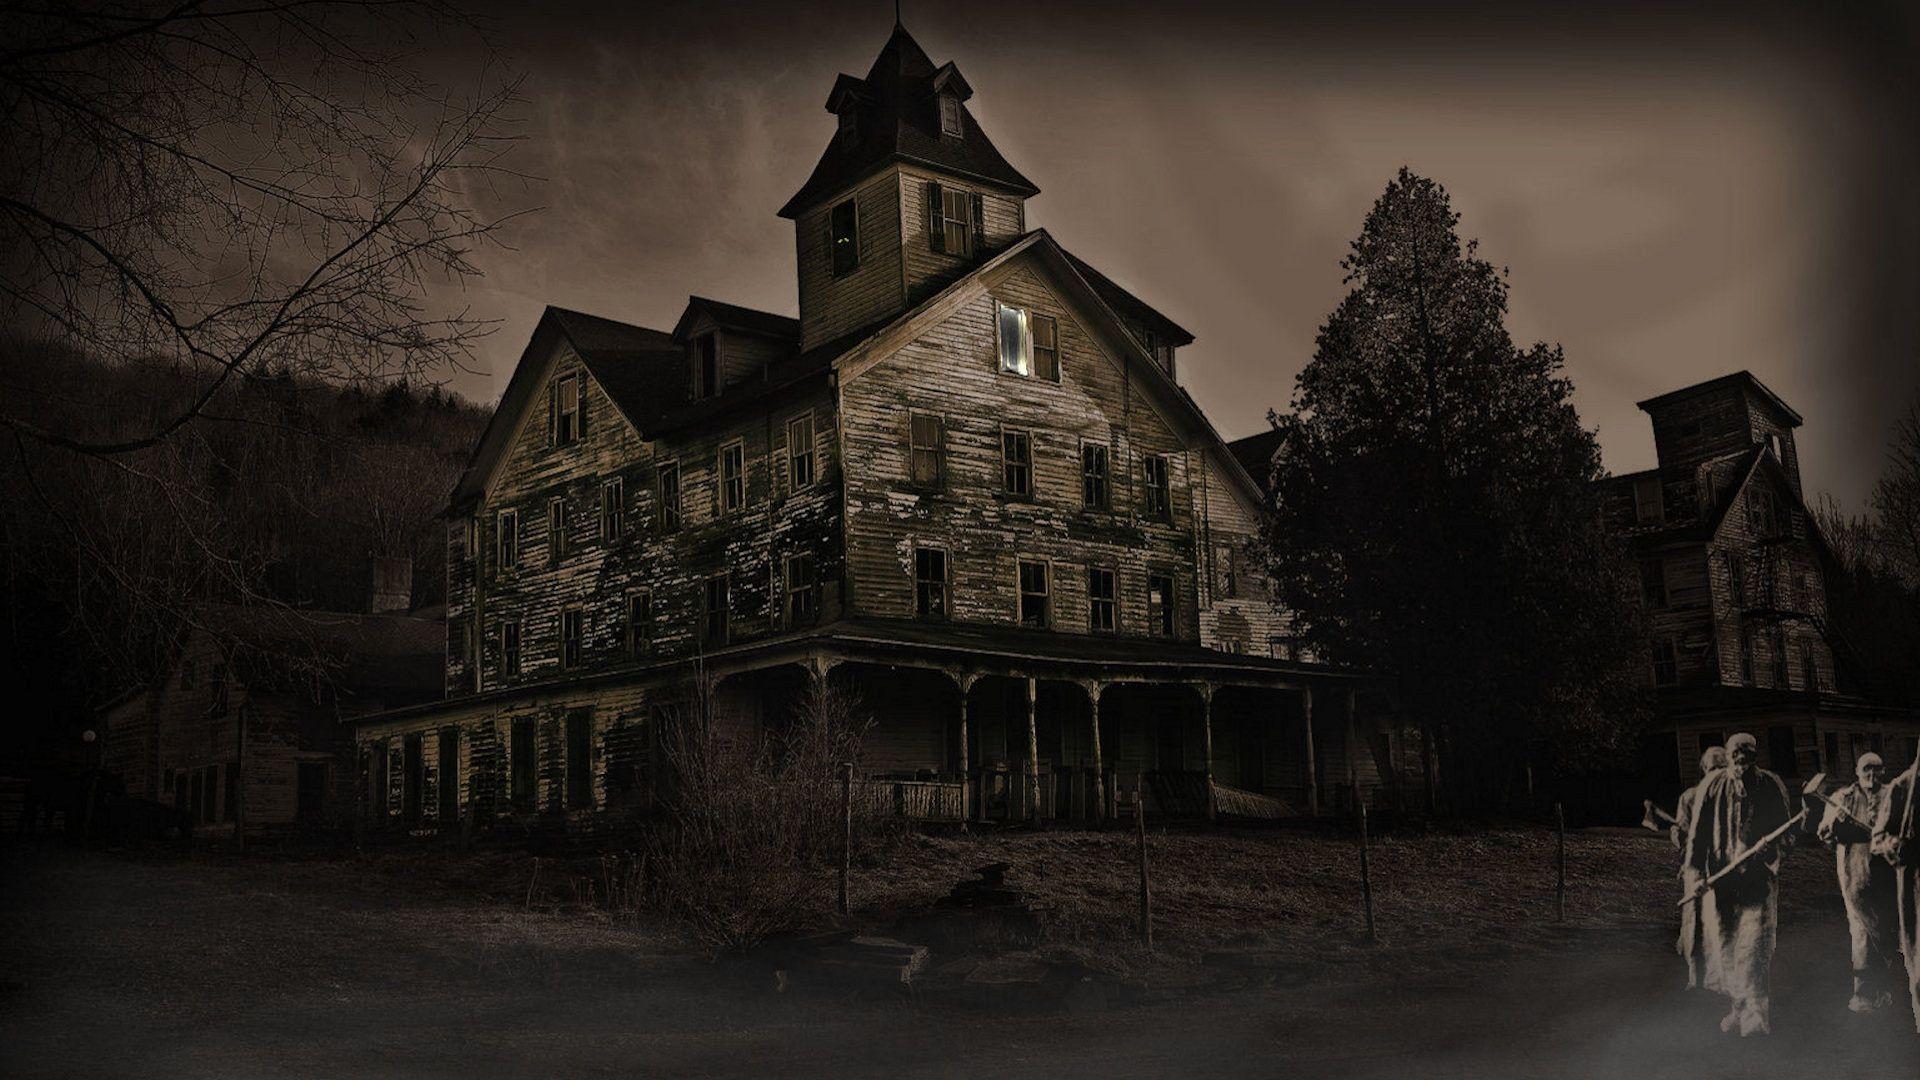 Animated Haunted House Wallpaper - WallpaperSafari